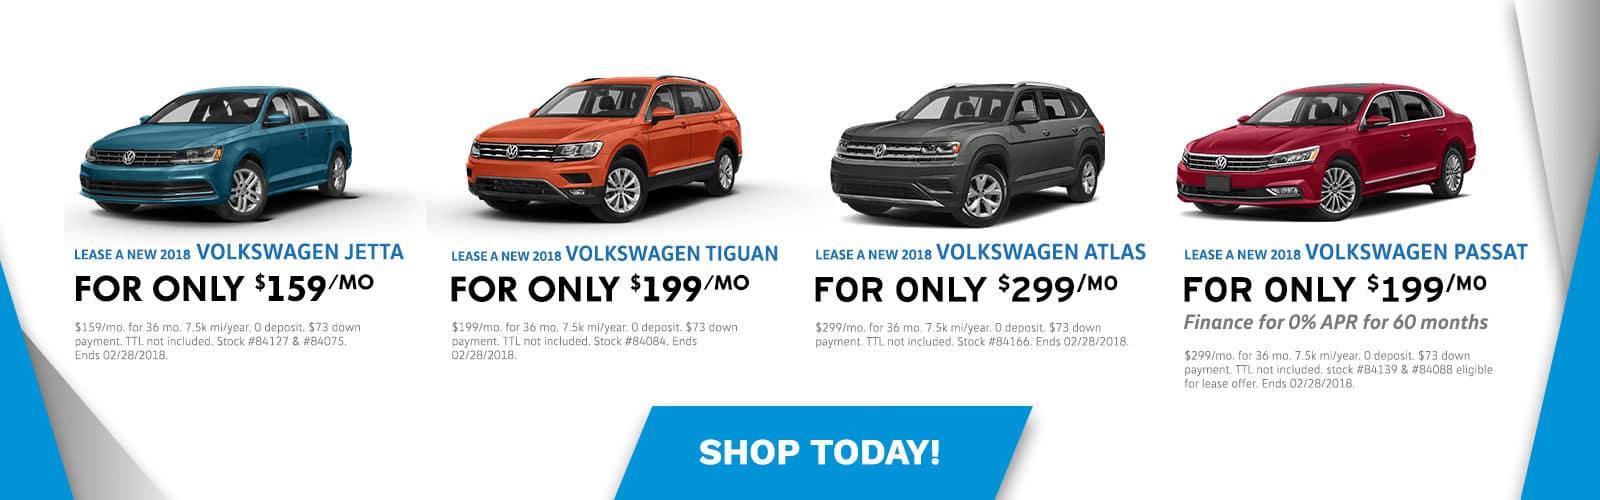 Auffenberg VW February Offers